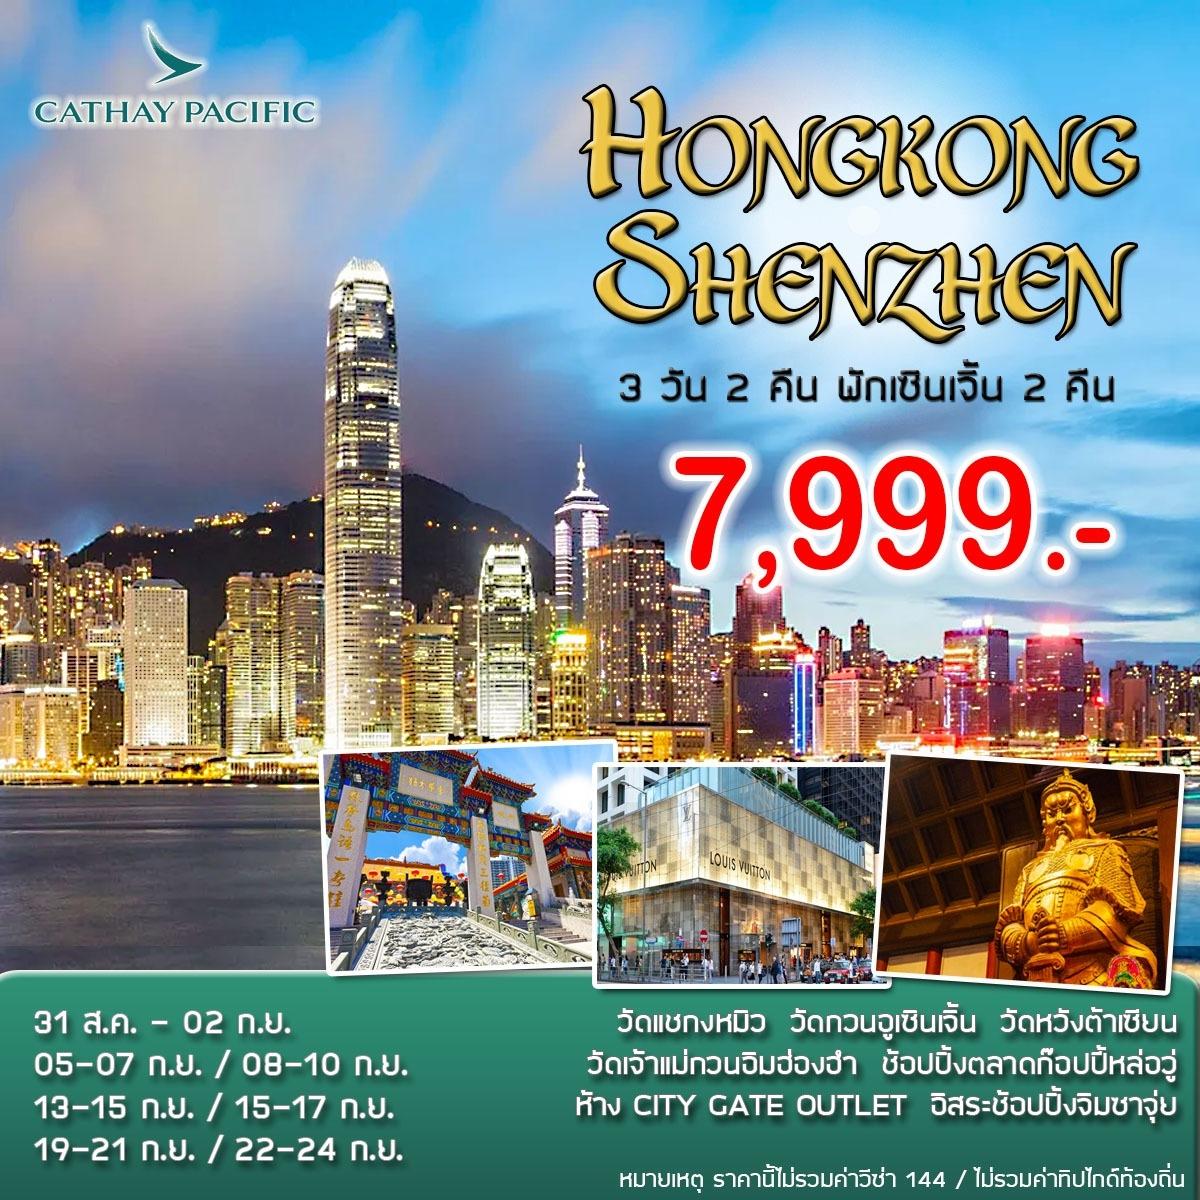 PROMOTION HONGKONG SHENZHEN SEP 19 BY CX